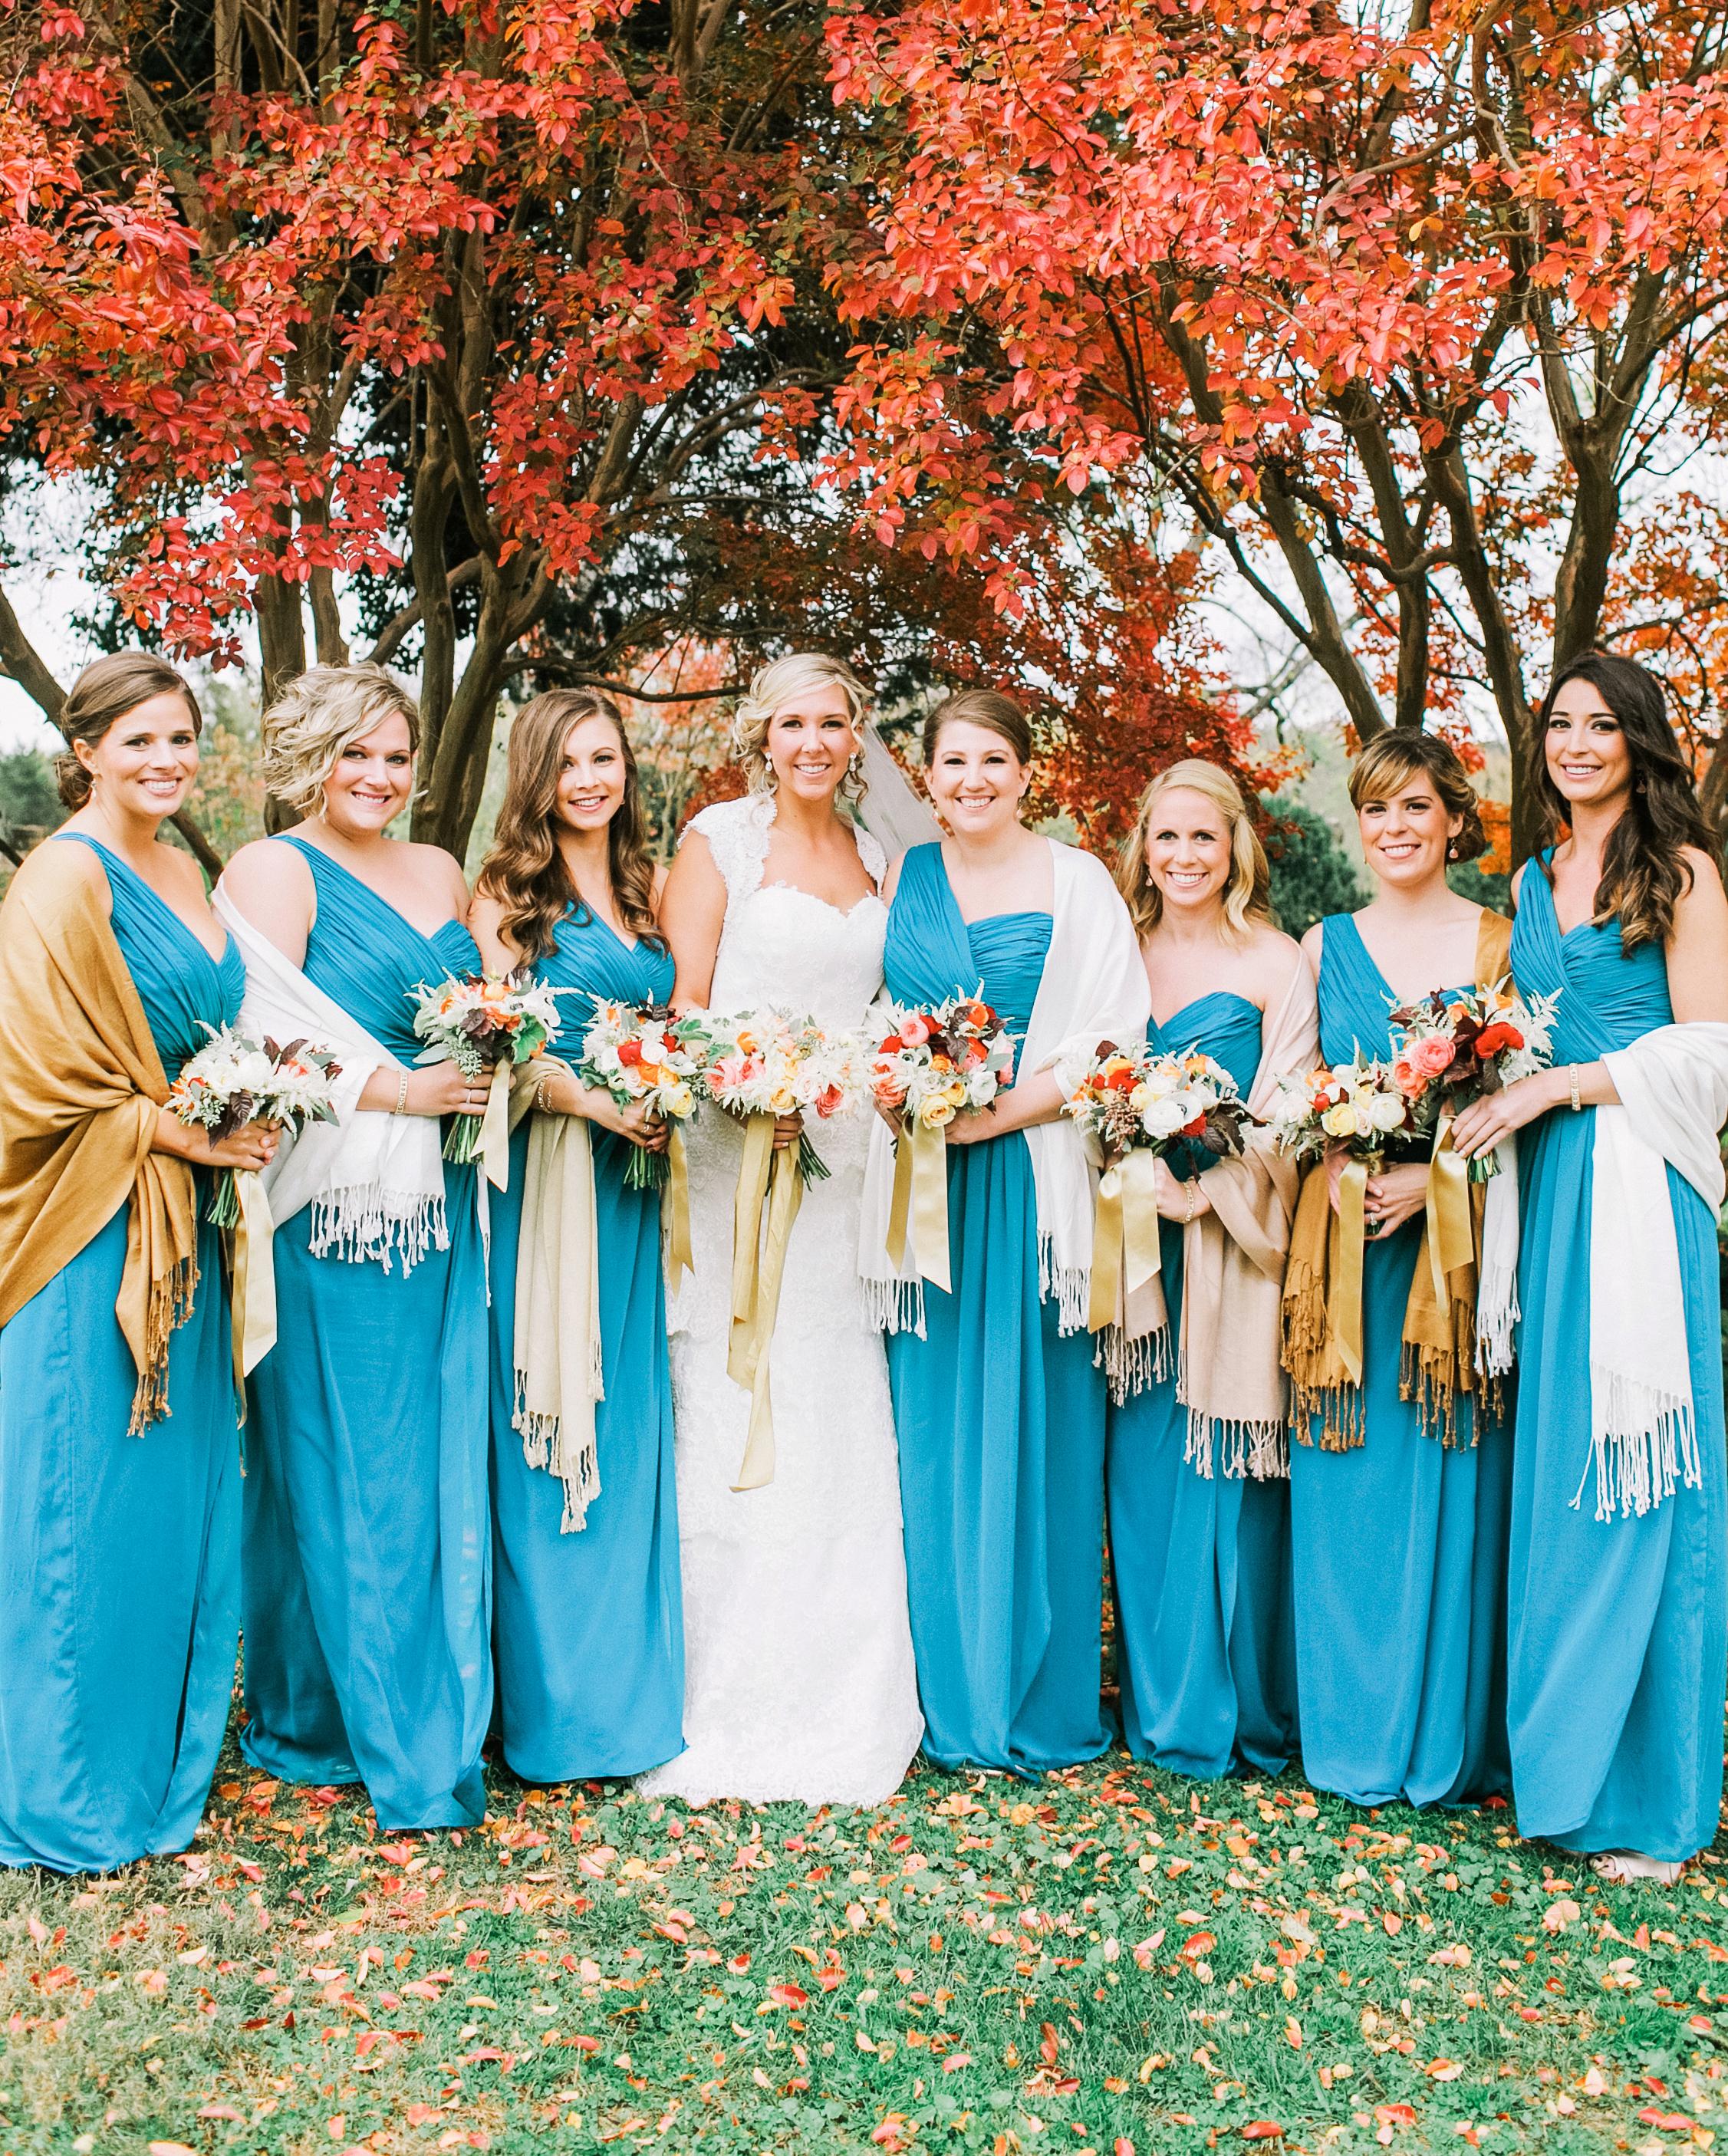 brittany-andrew-wedding-bridesmaids-023-s112067-0715.jpg